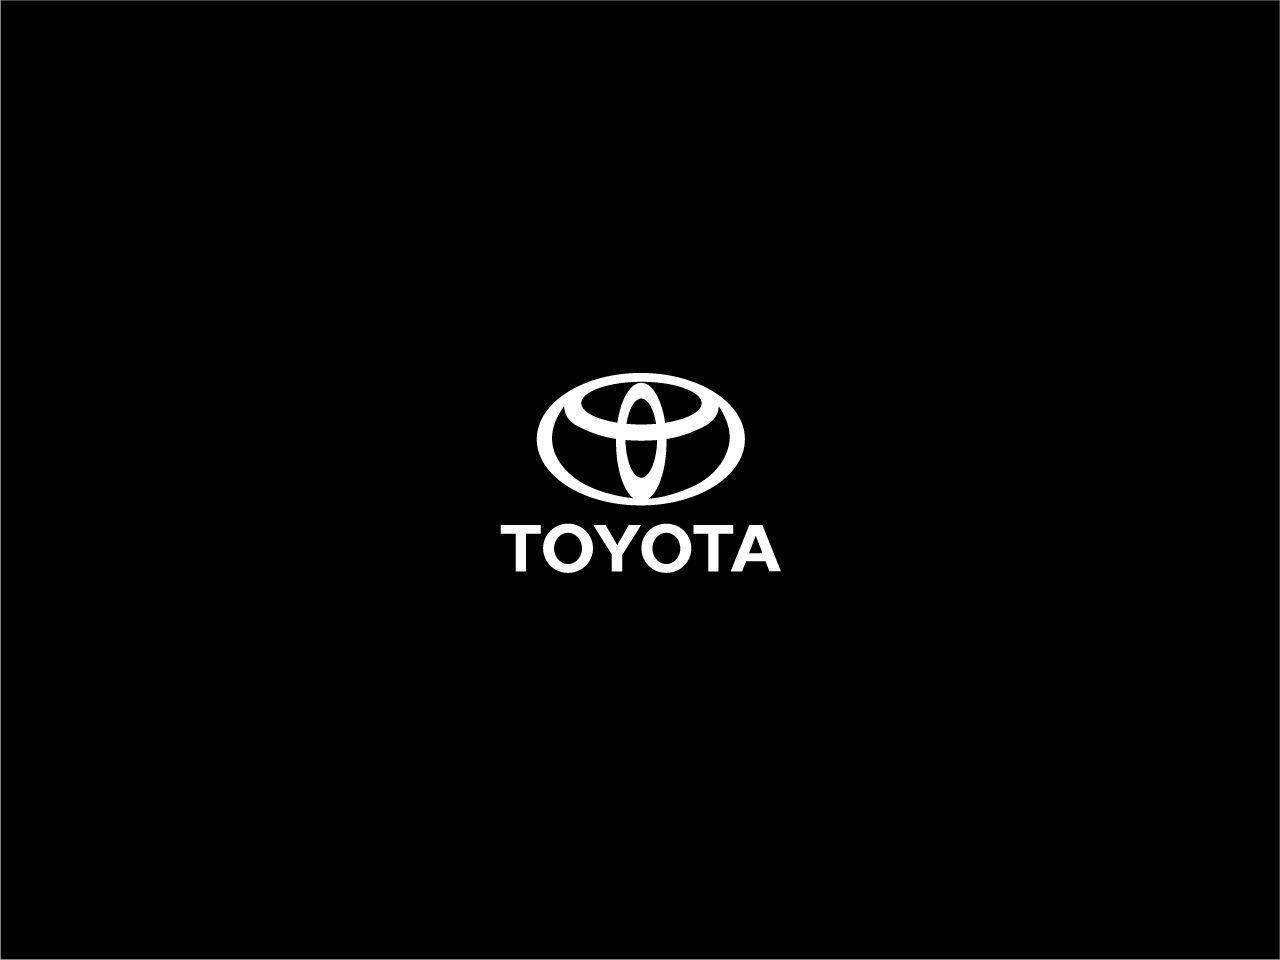 Toyota Logo Wallpapers 1280x960